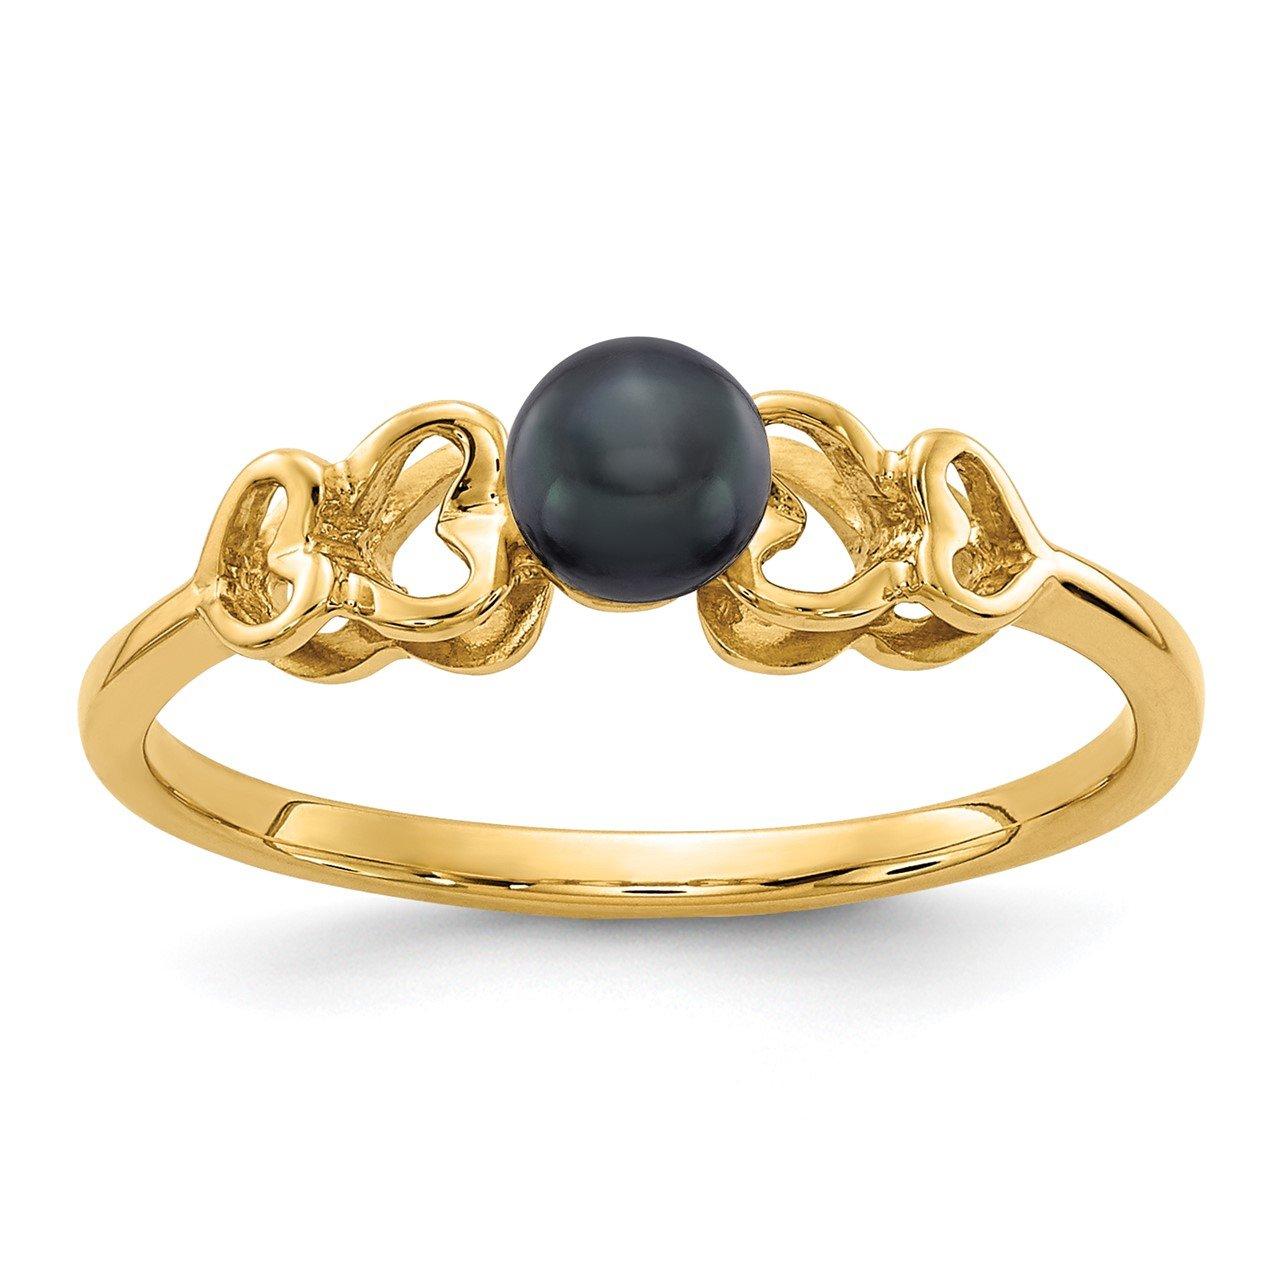 14k 4mm Black FW Cultured Pearl ring